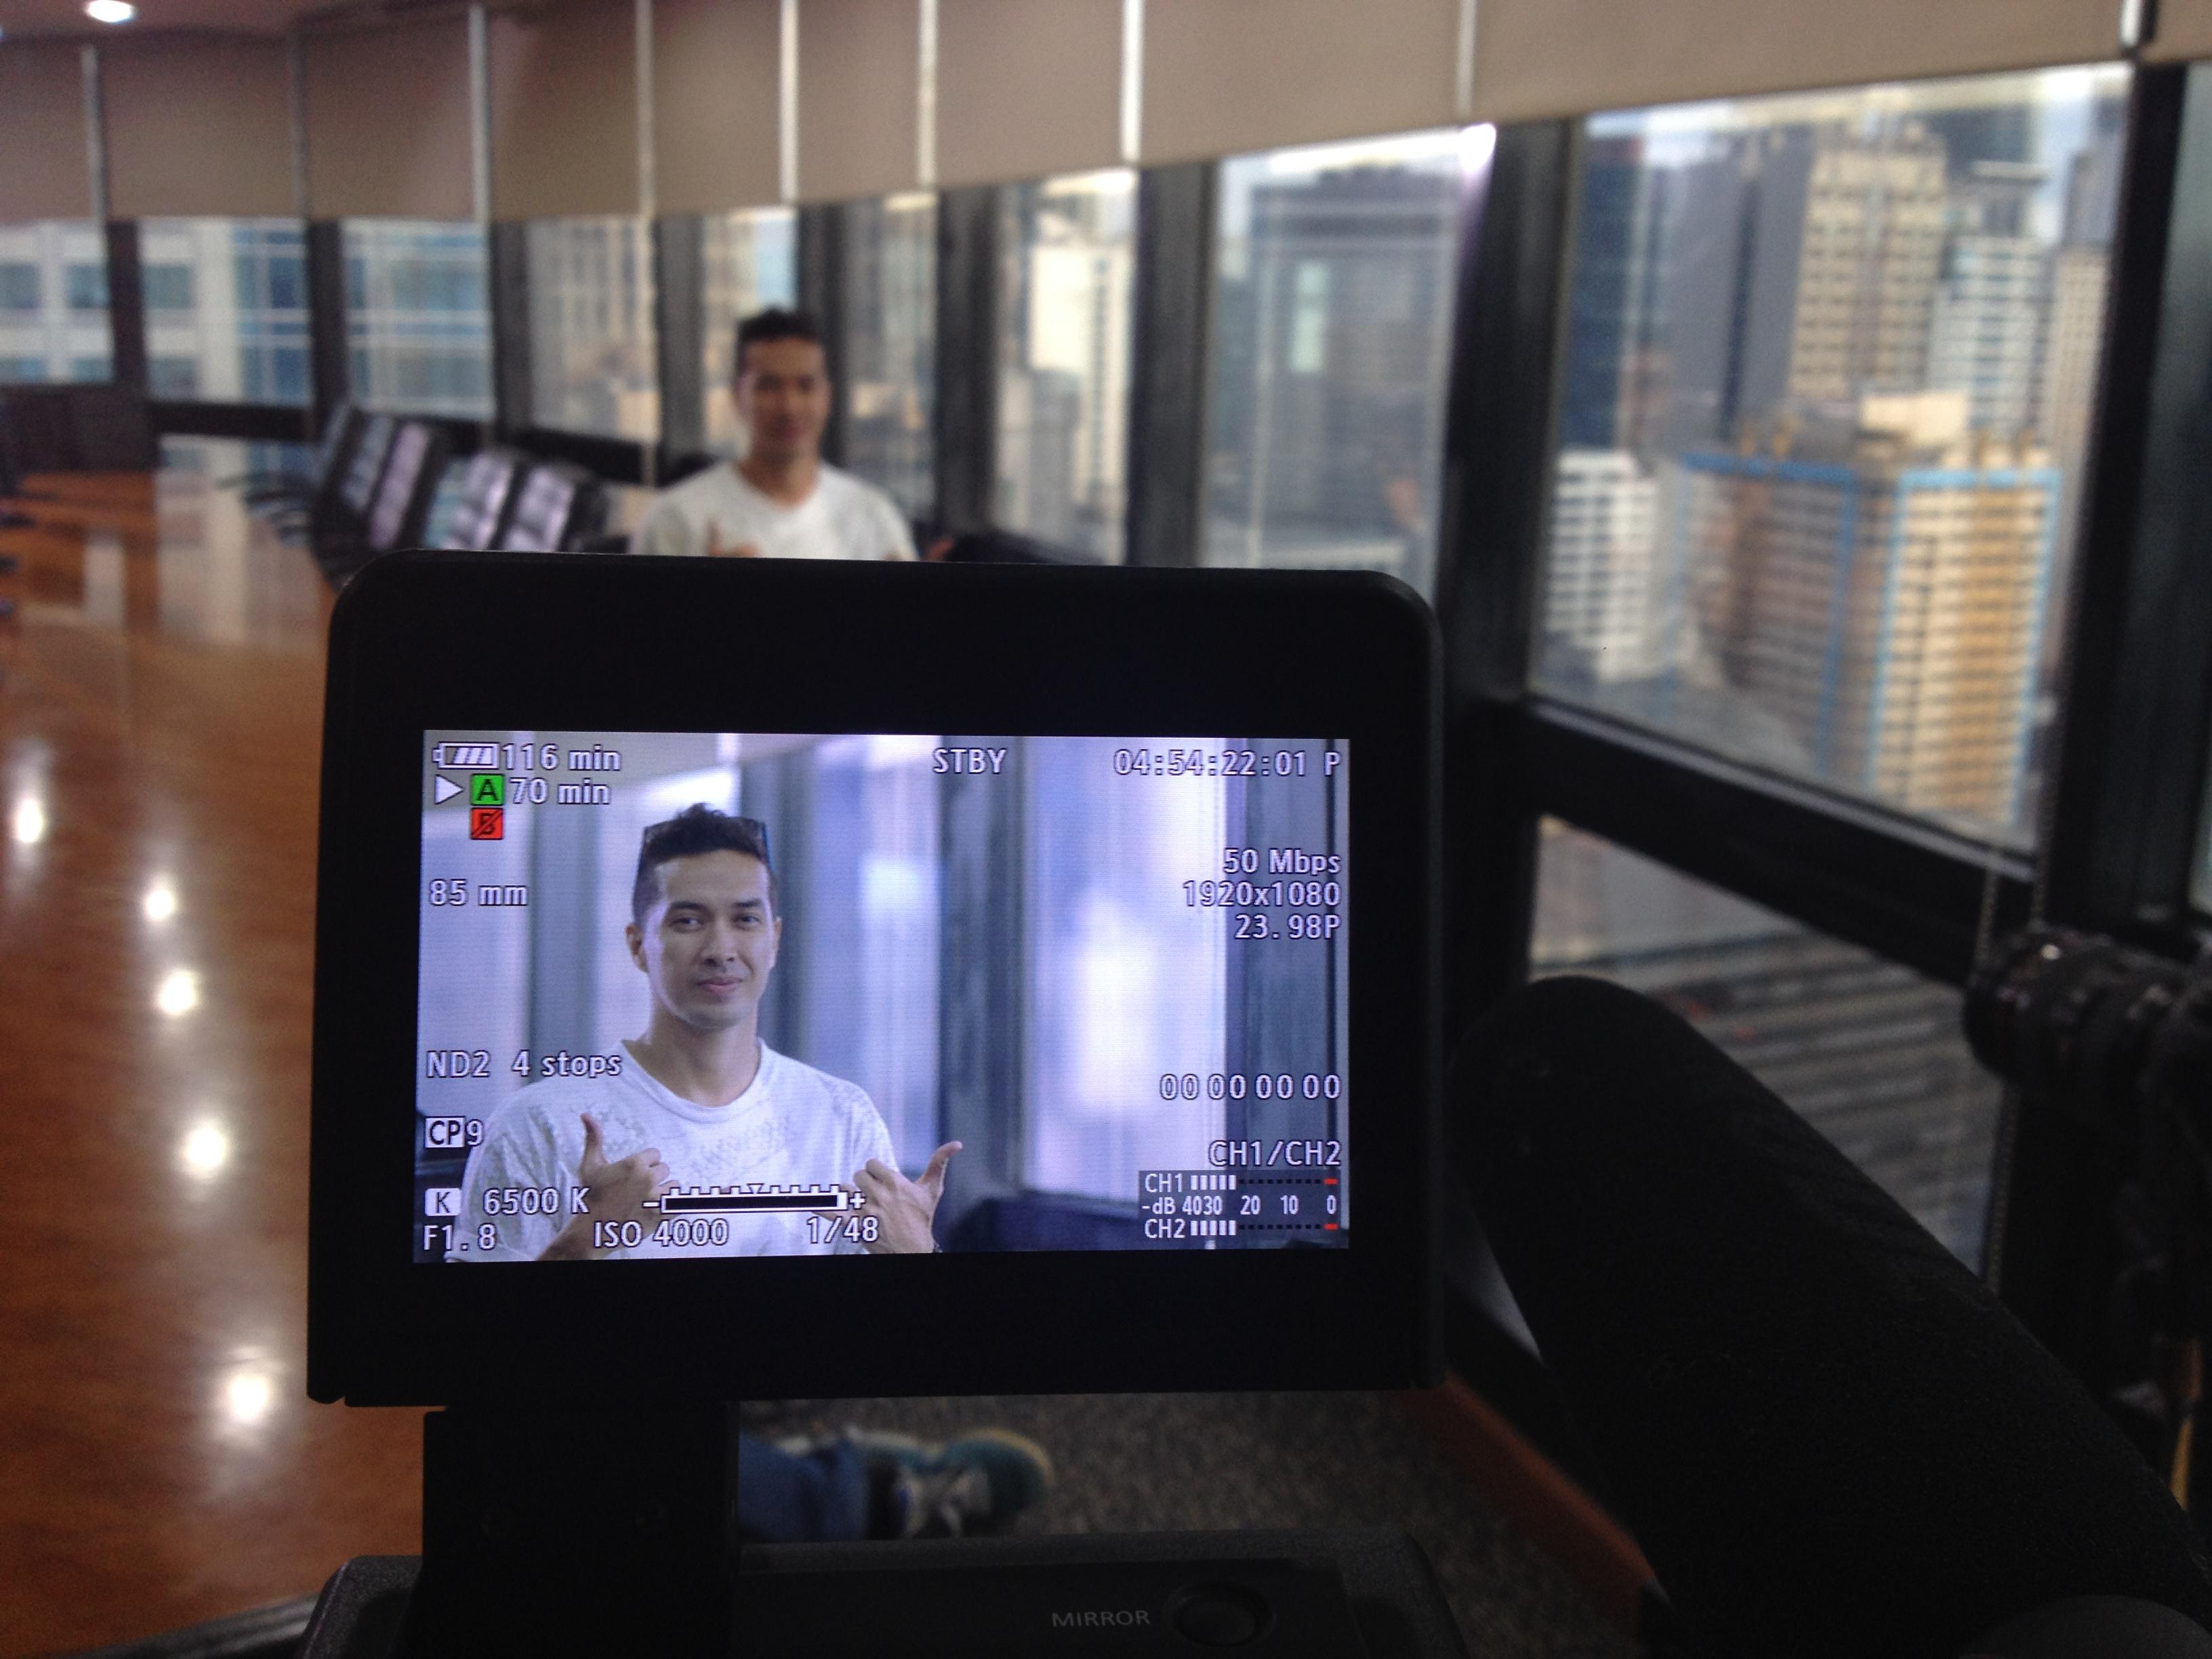 Behind the scenes of Twenty Manila